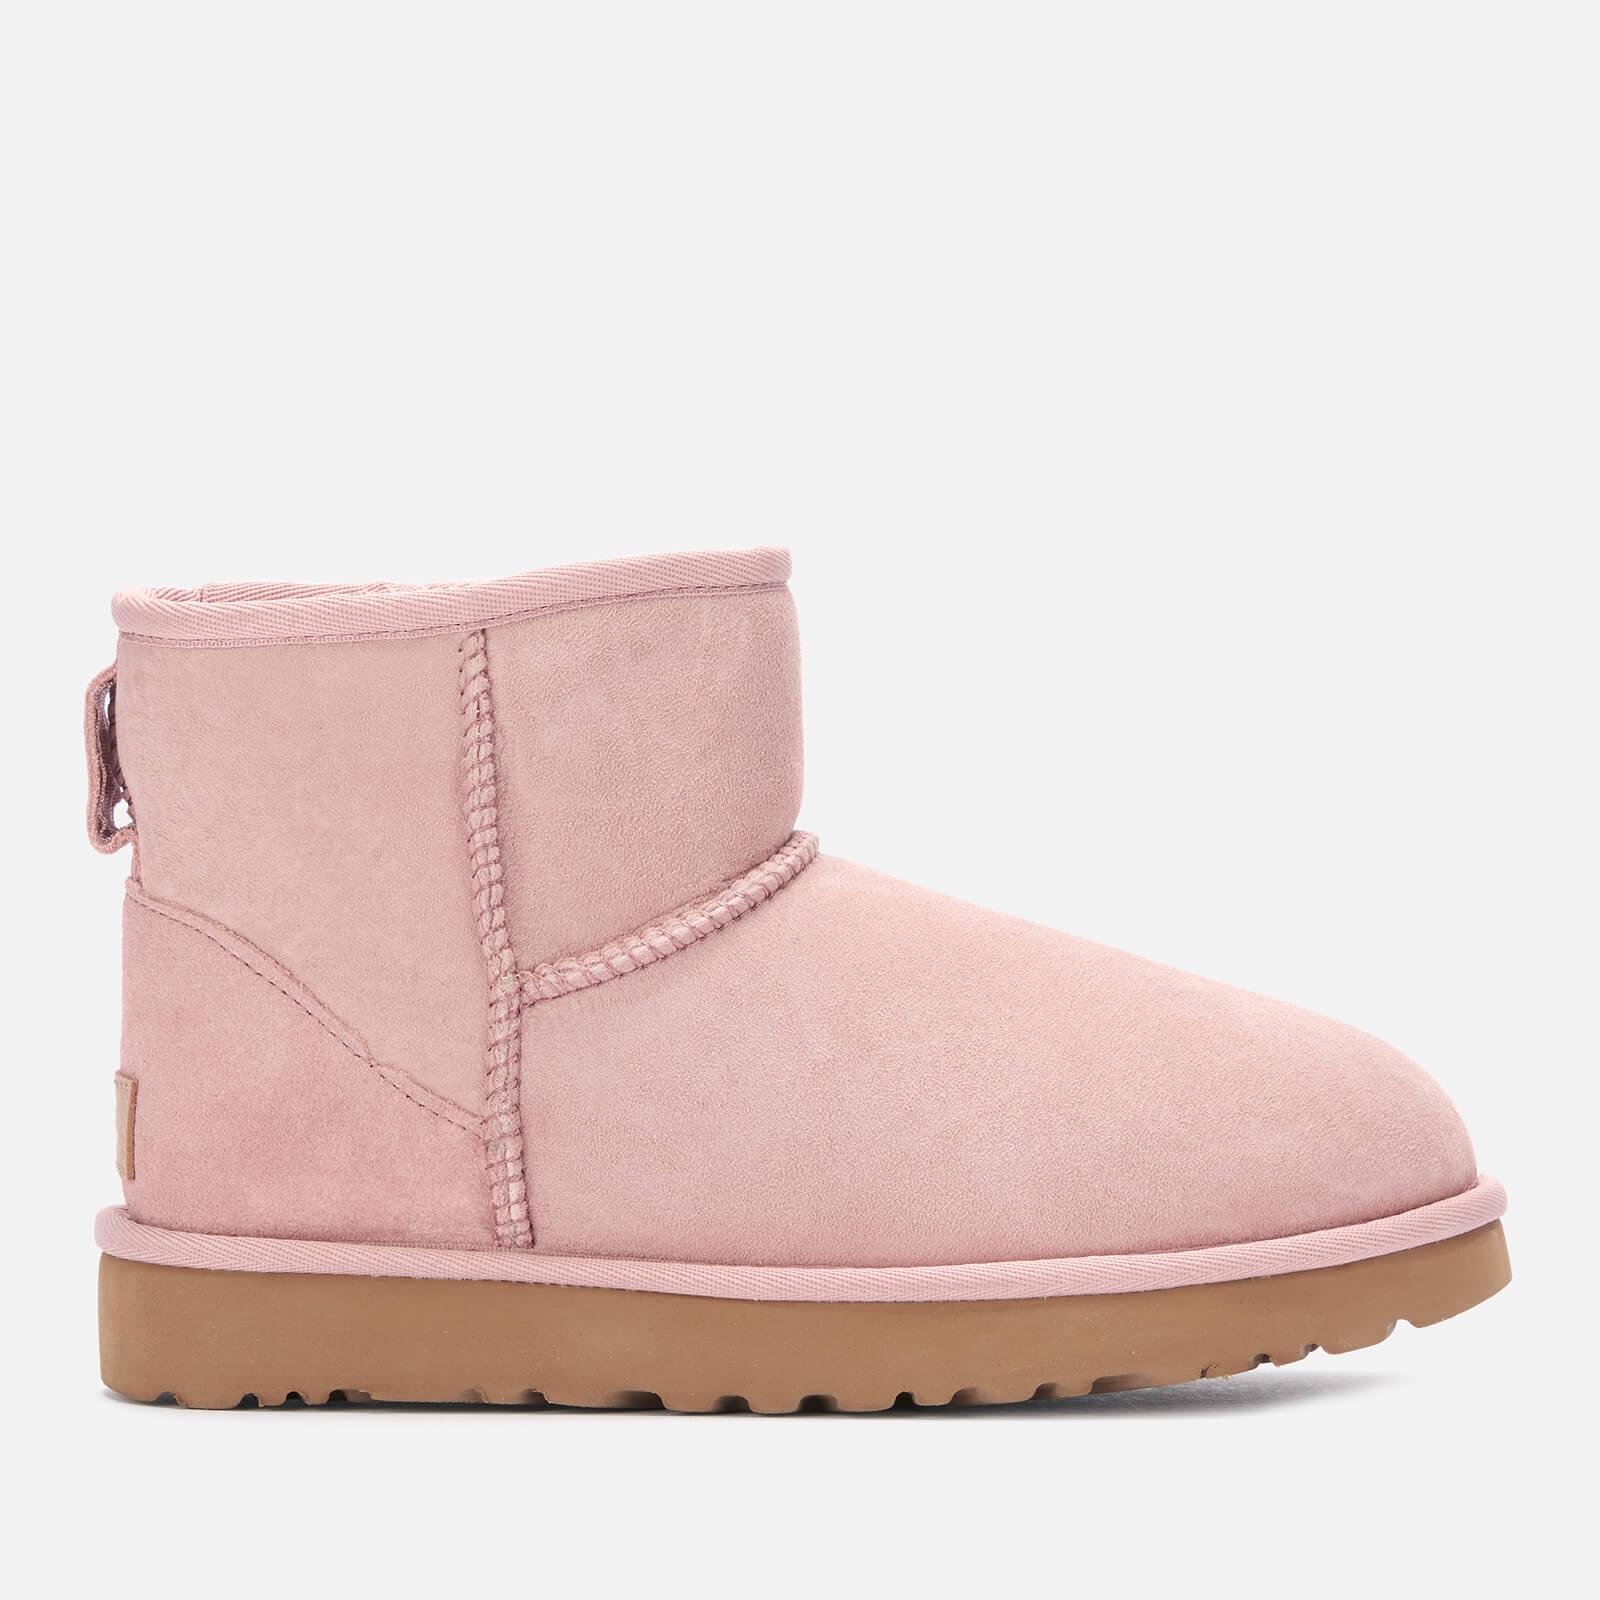 UGG Women's Classic Mini II Sheepskin Boots - Pink Crystal - UK 8